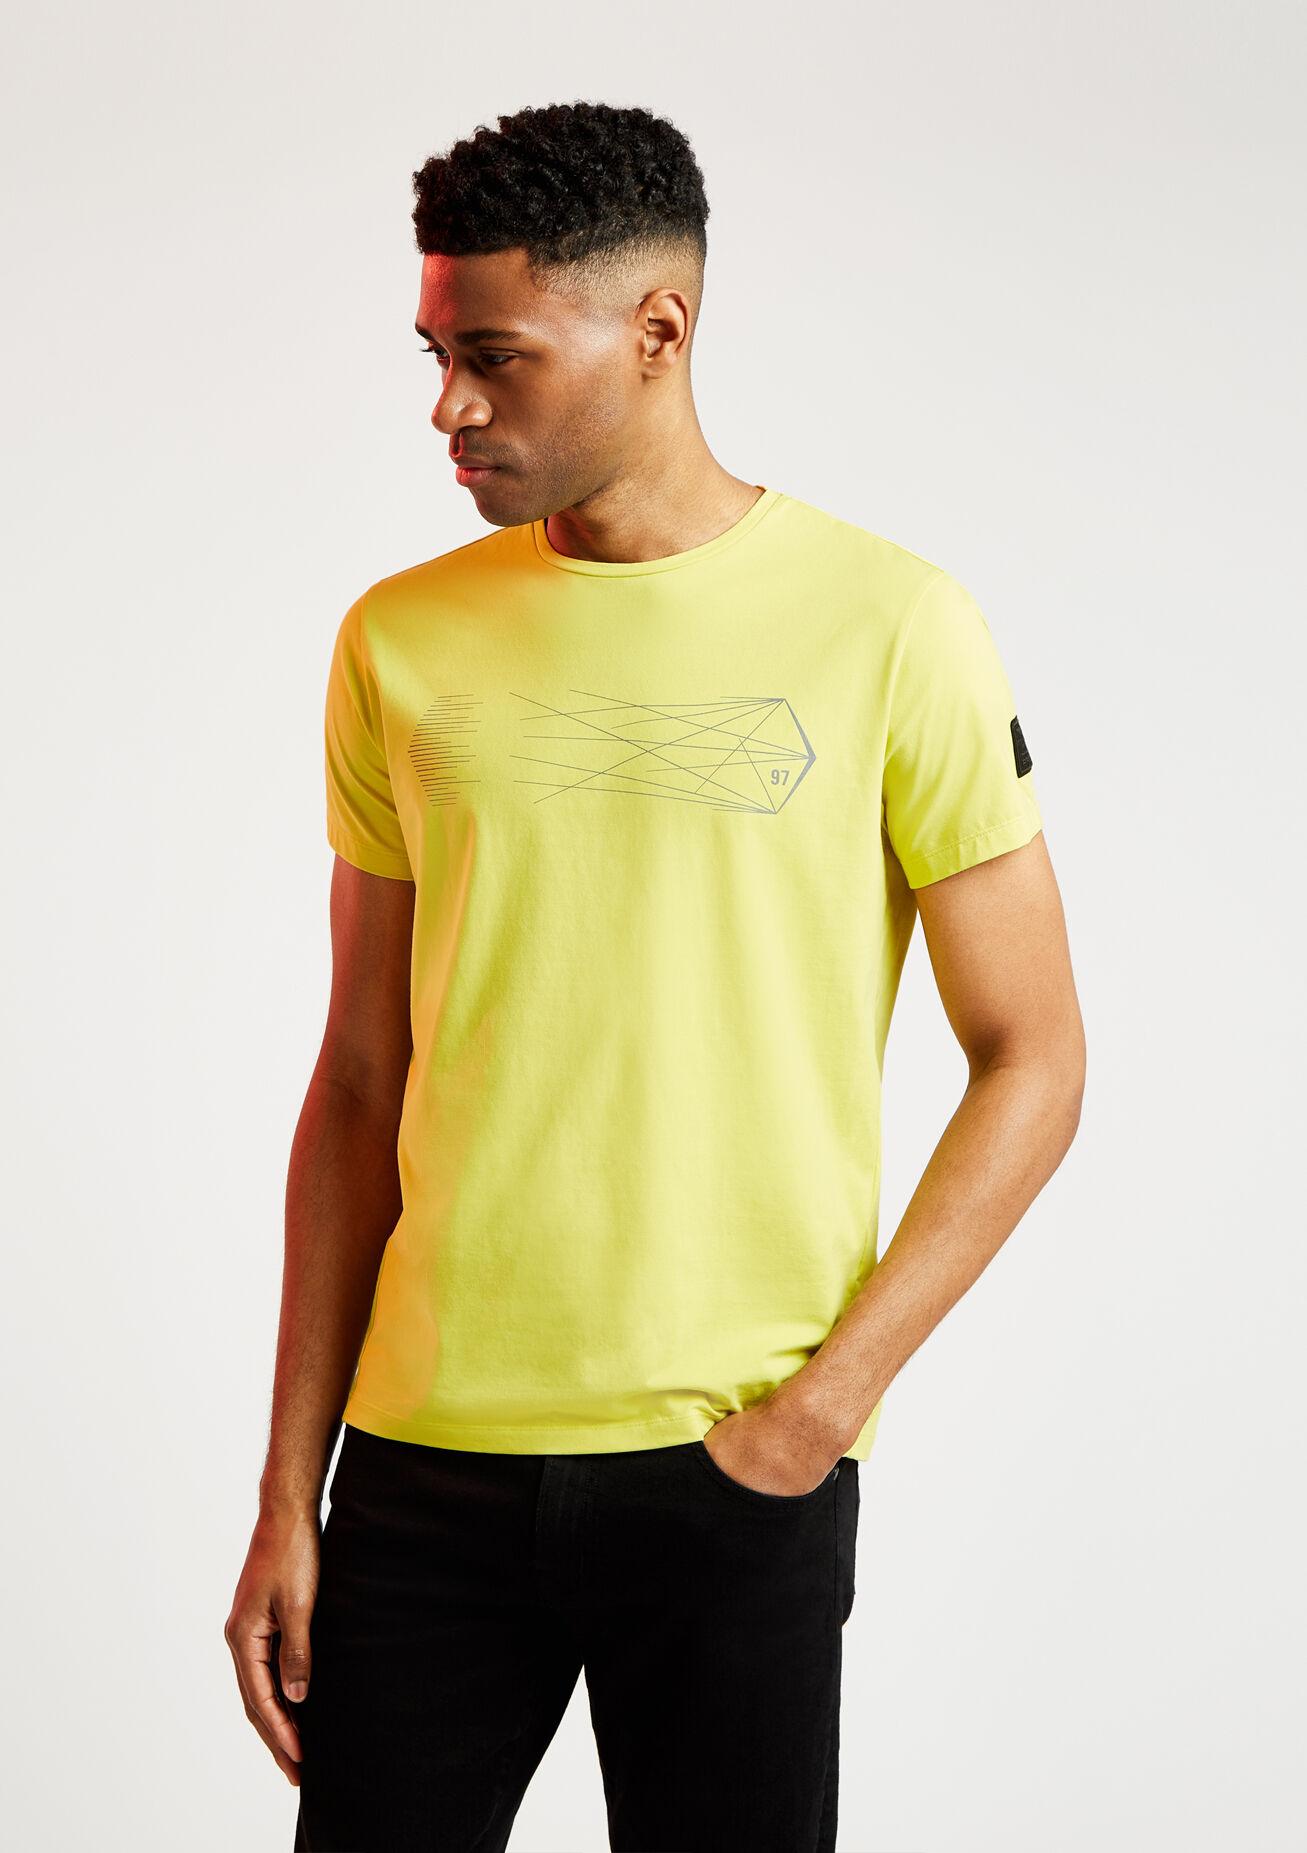 aston martin pro men's graphic t-shirt | small | millennium ylw